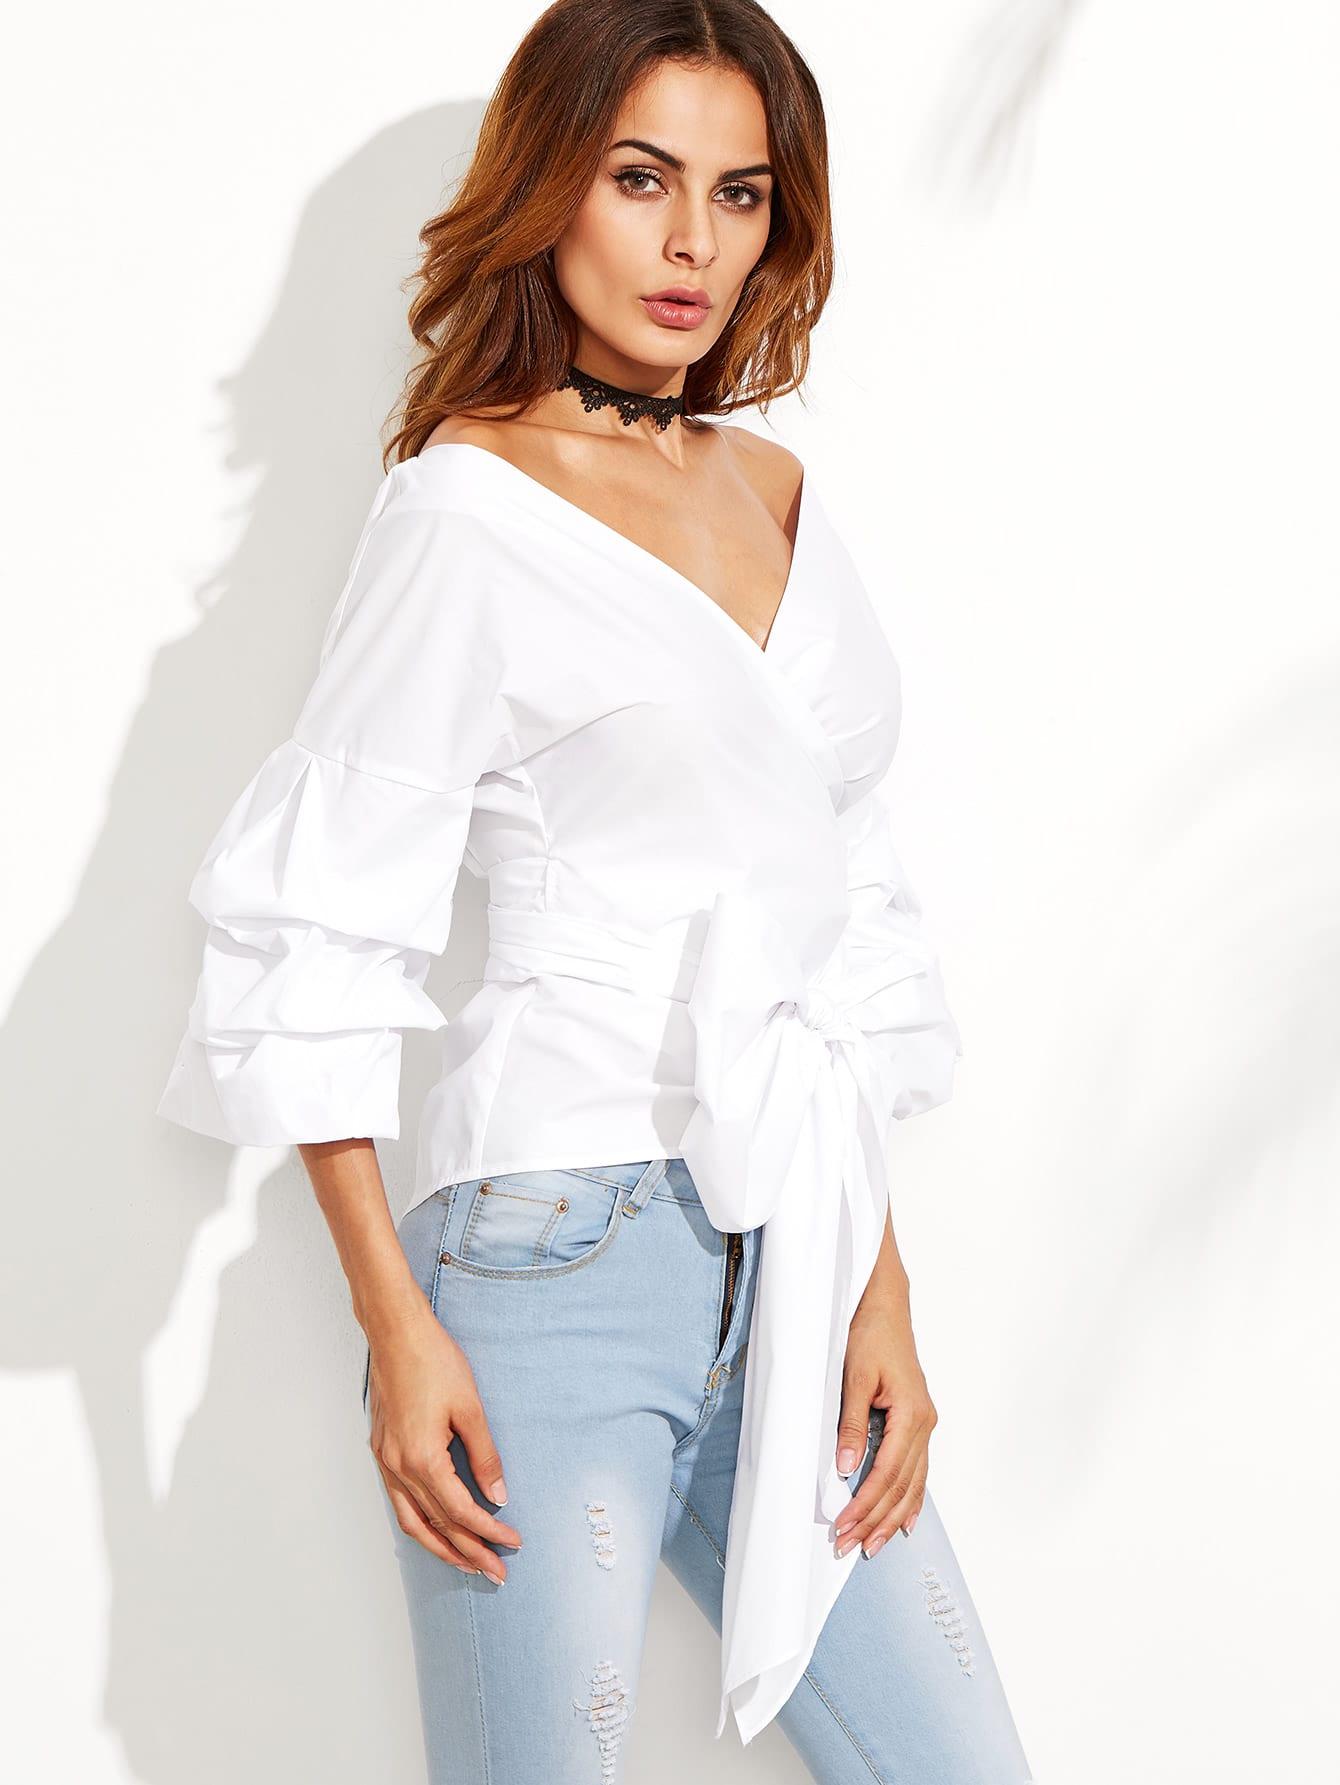 blouse160817701_2